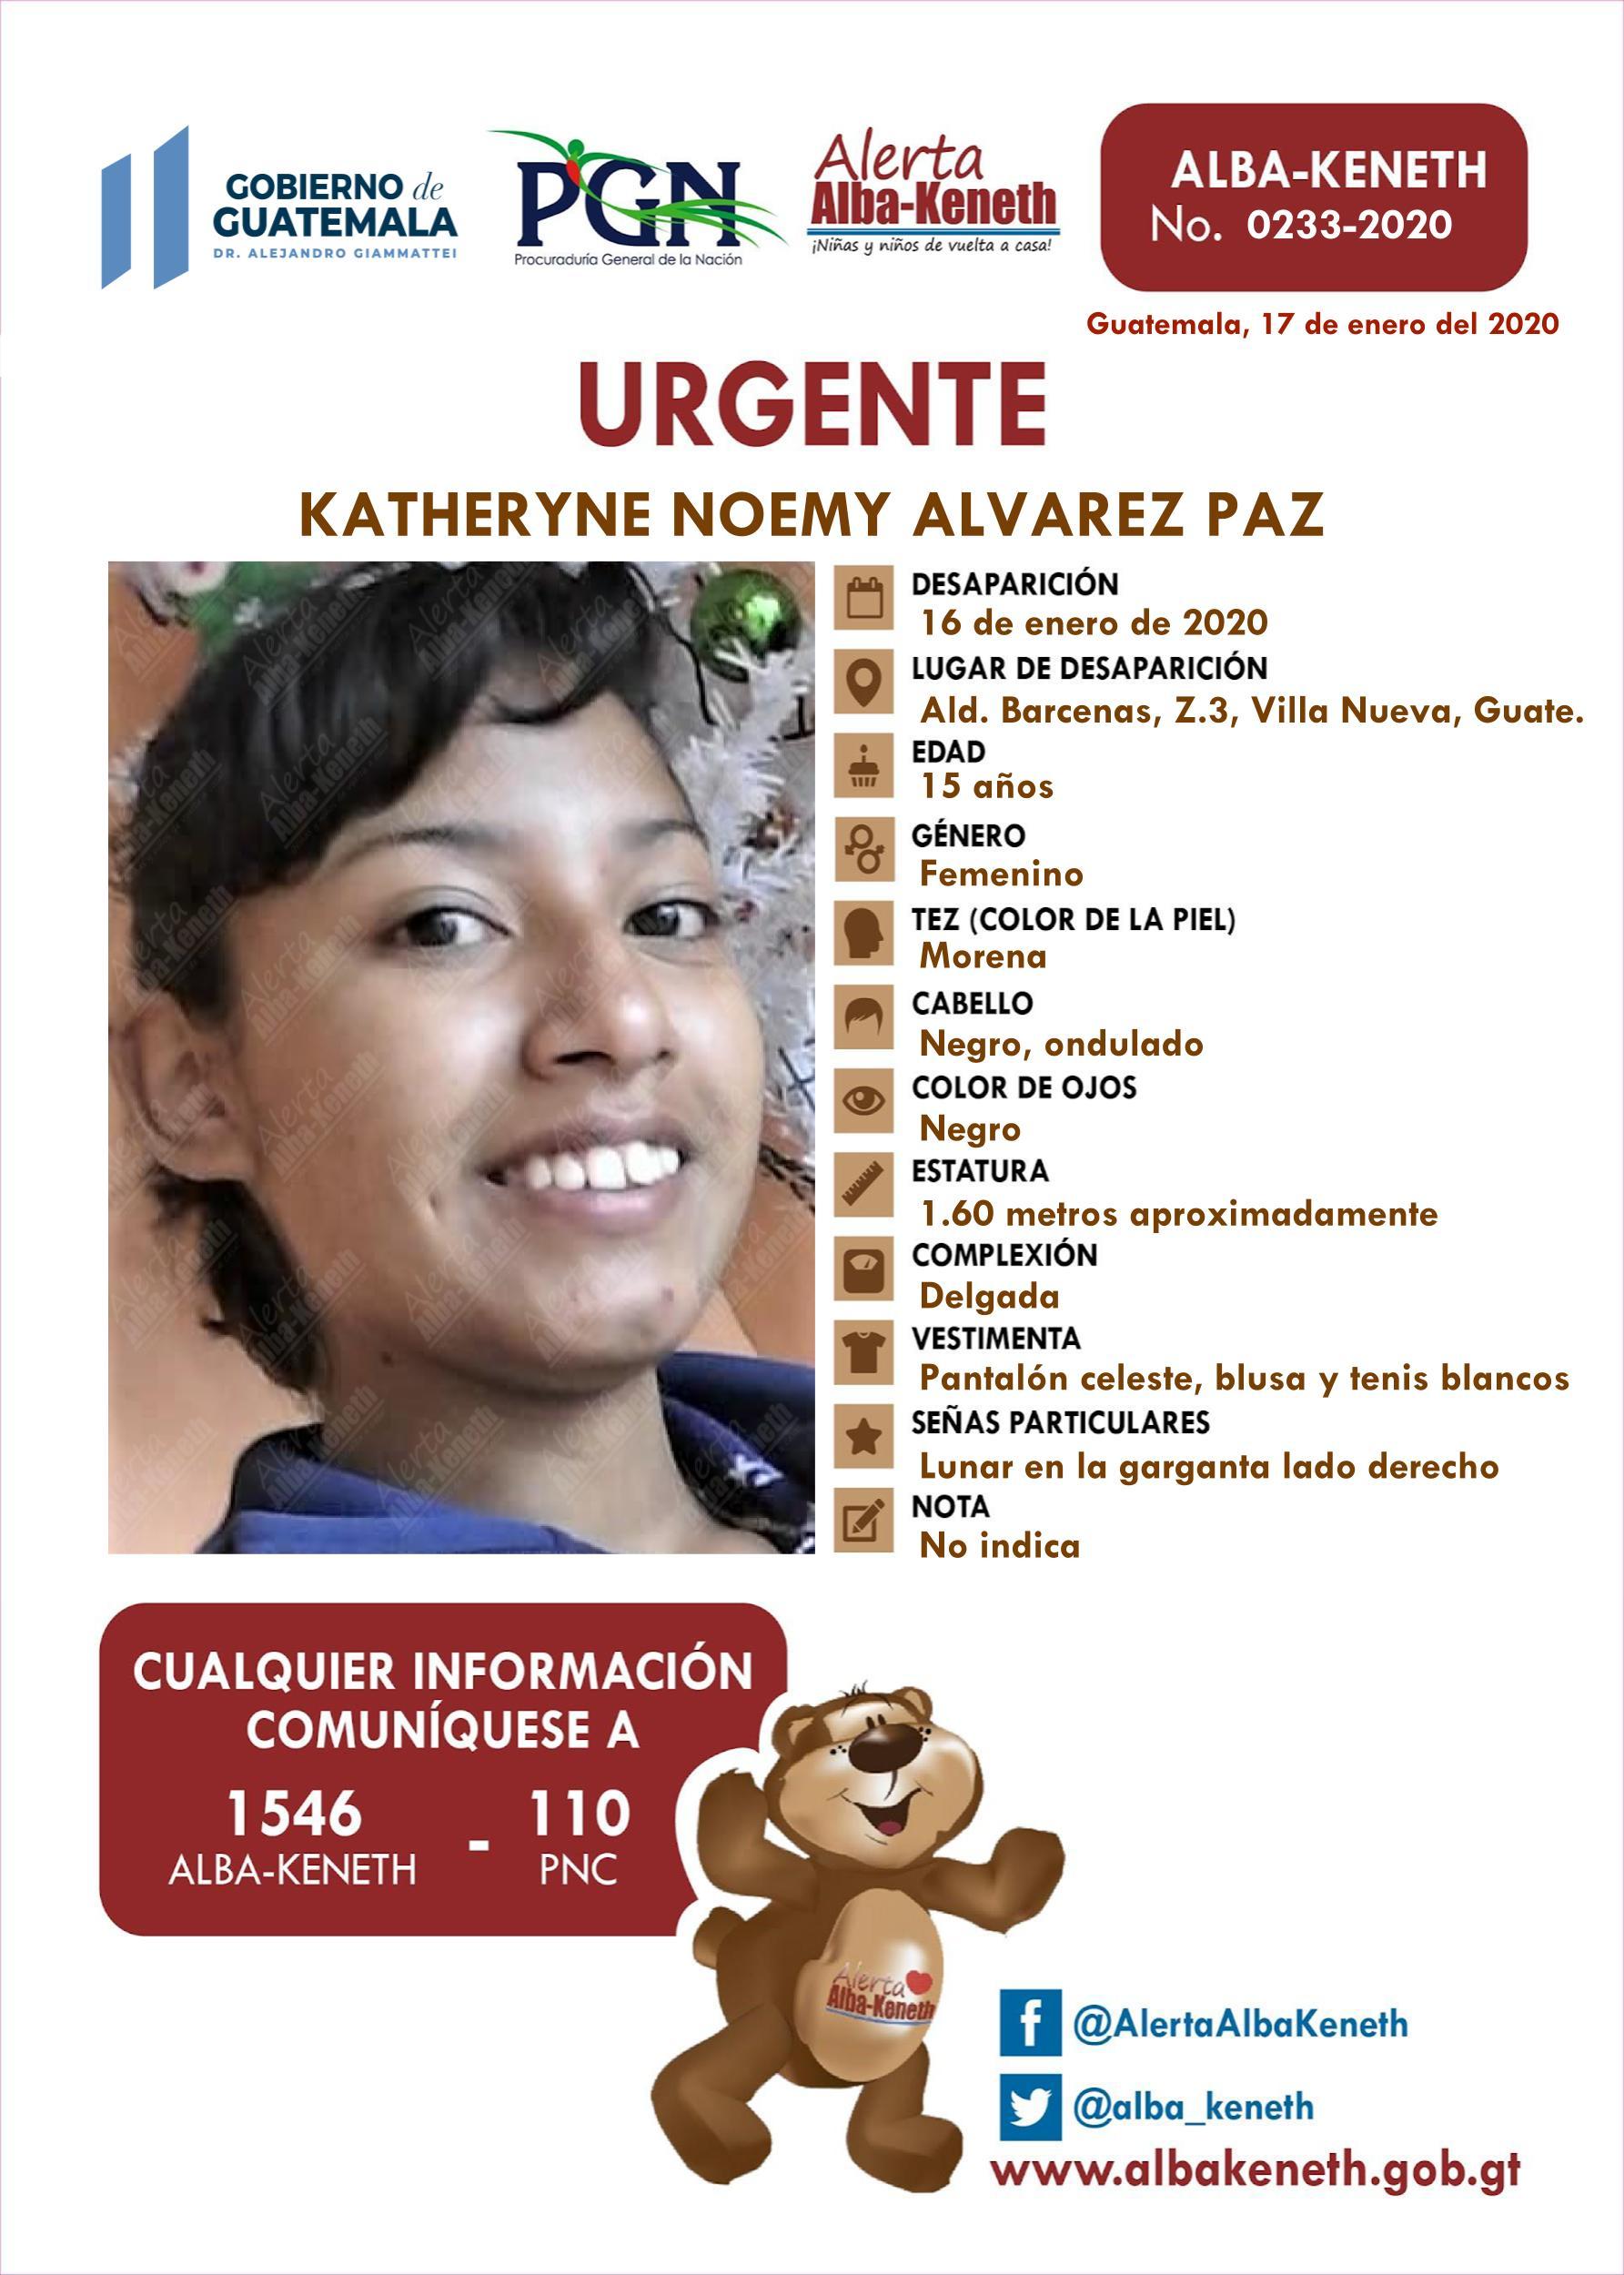 Katheryne Noemy Alvarez Paz